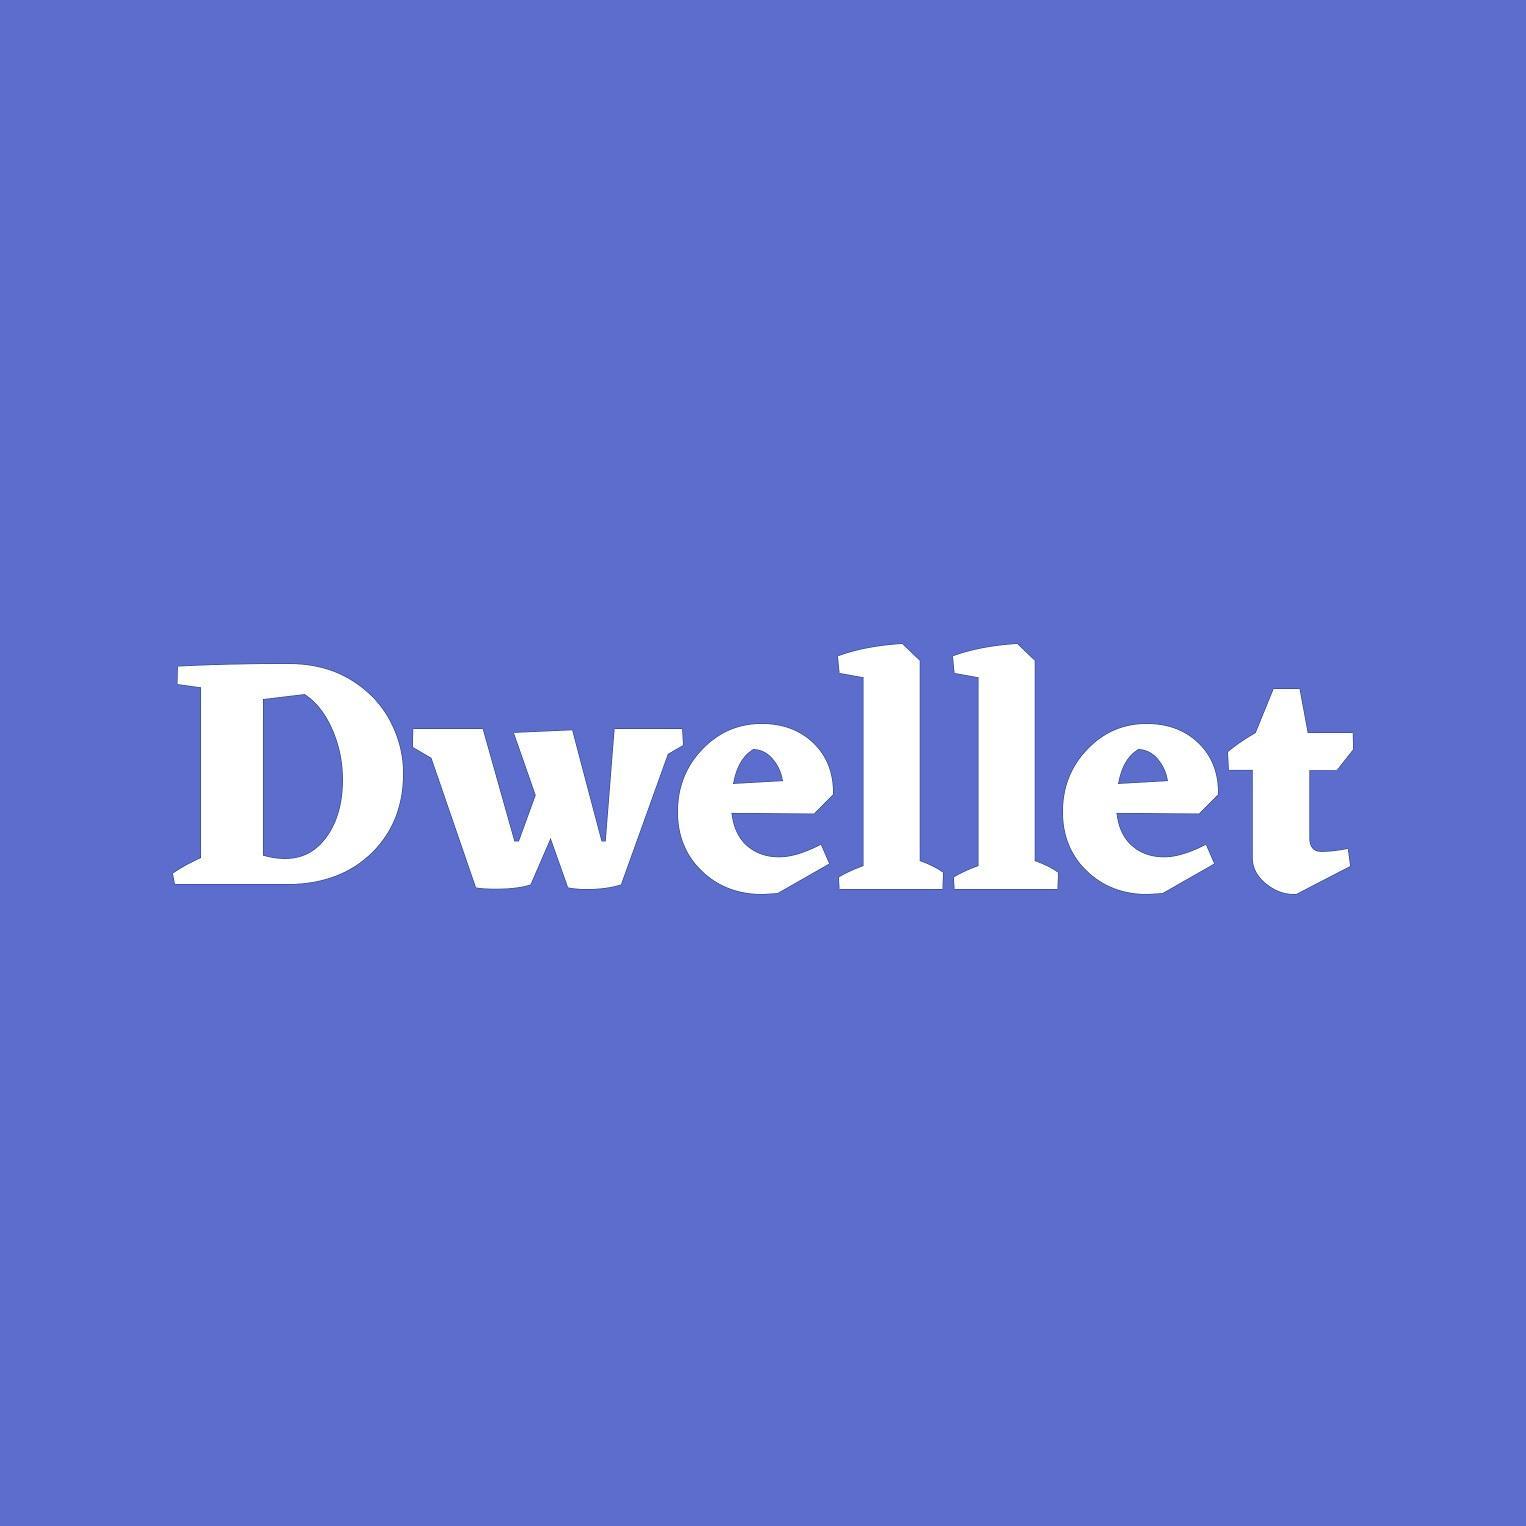 Yritys: Dwellet Oy